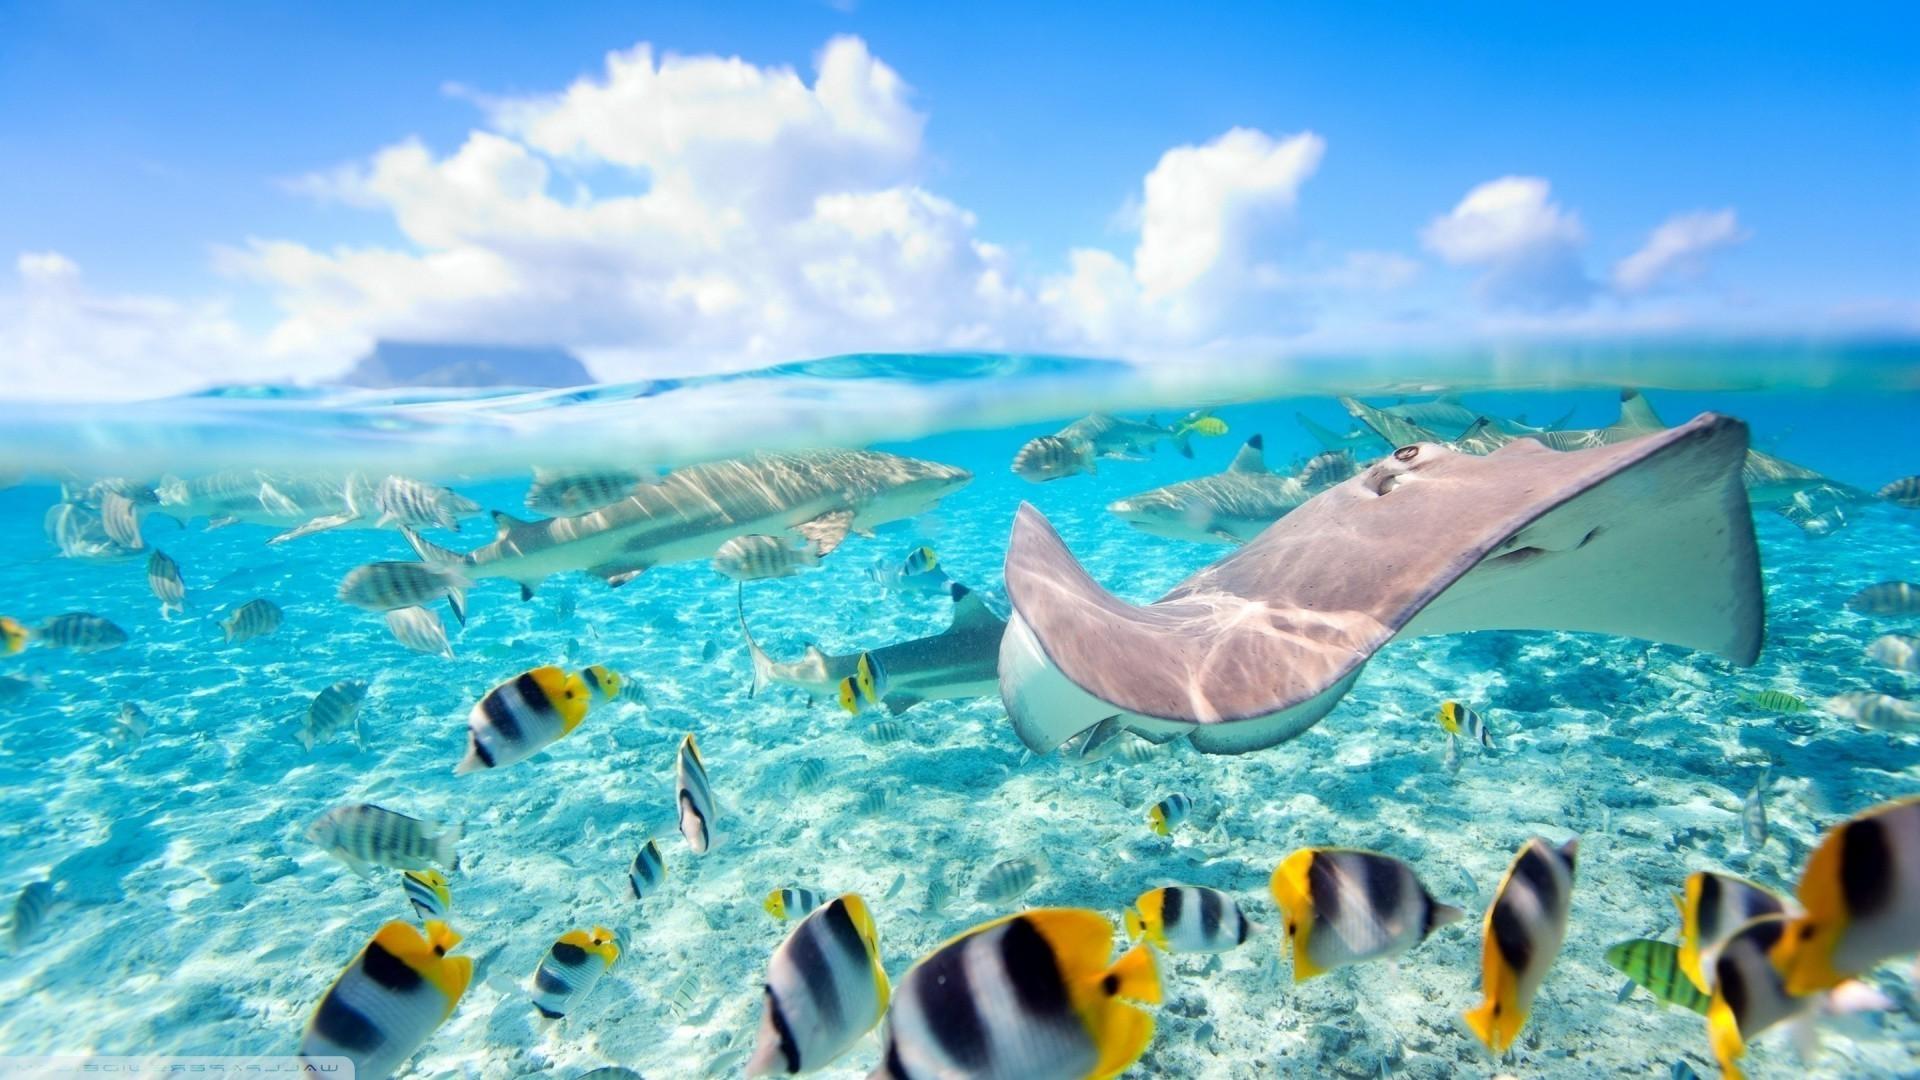 Bora Bora Wallpaper 70 Images